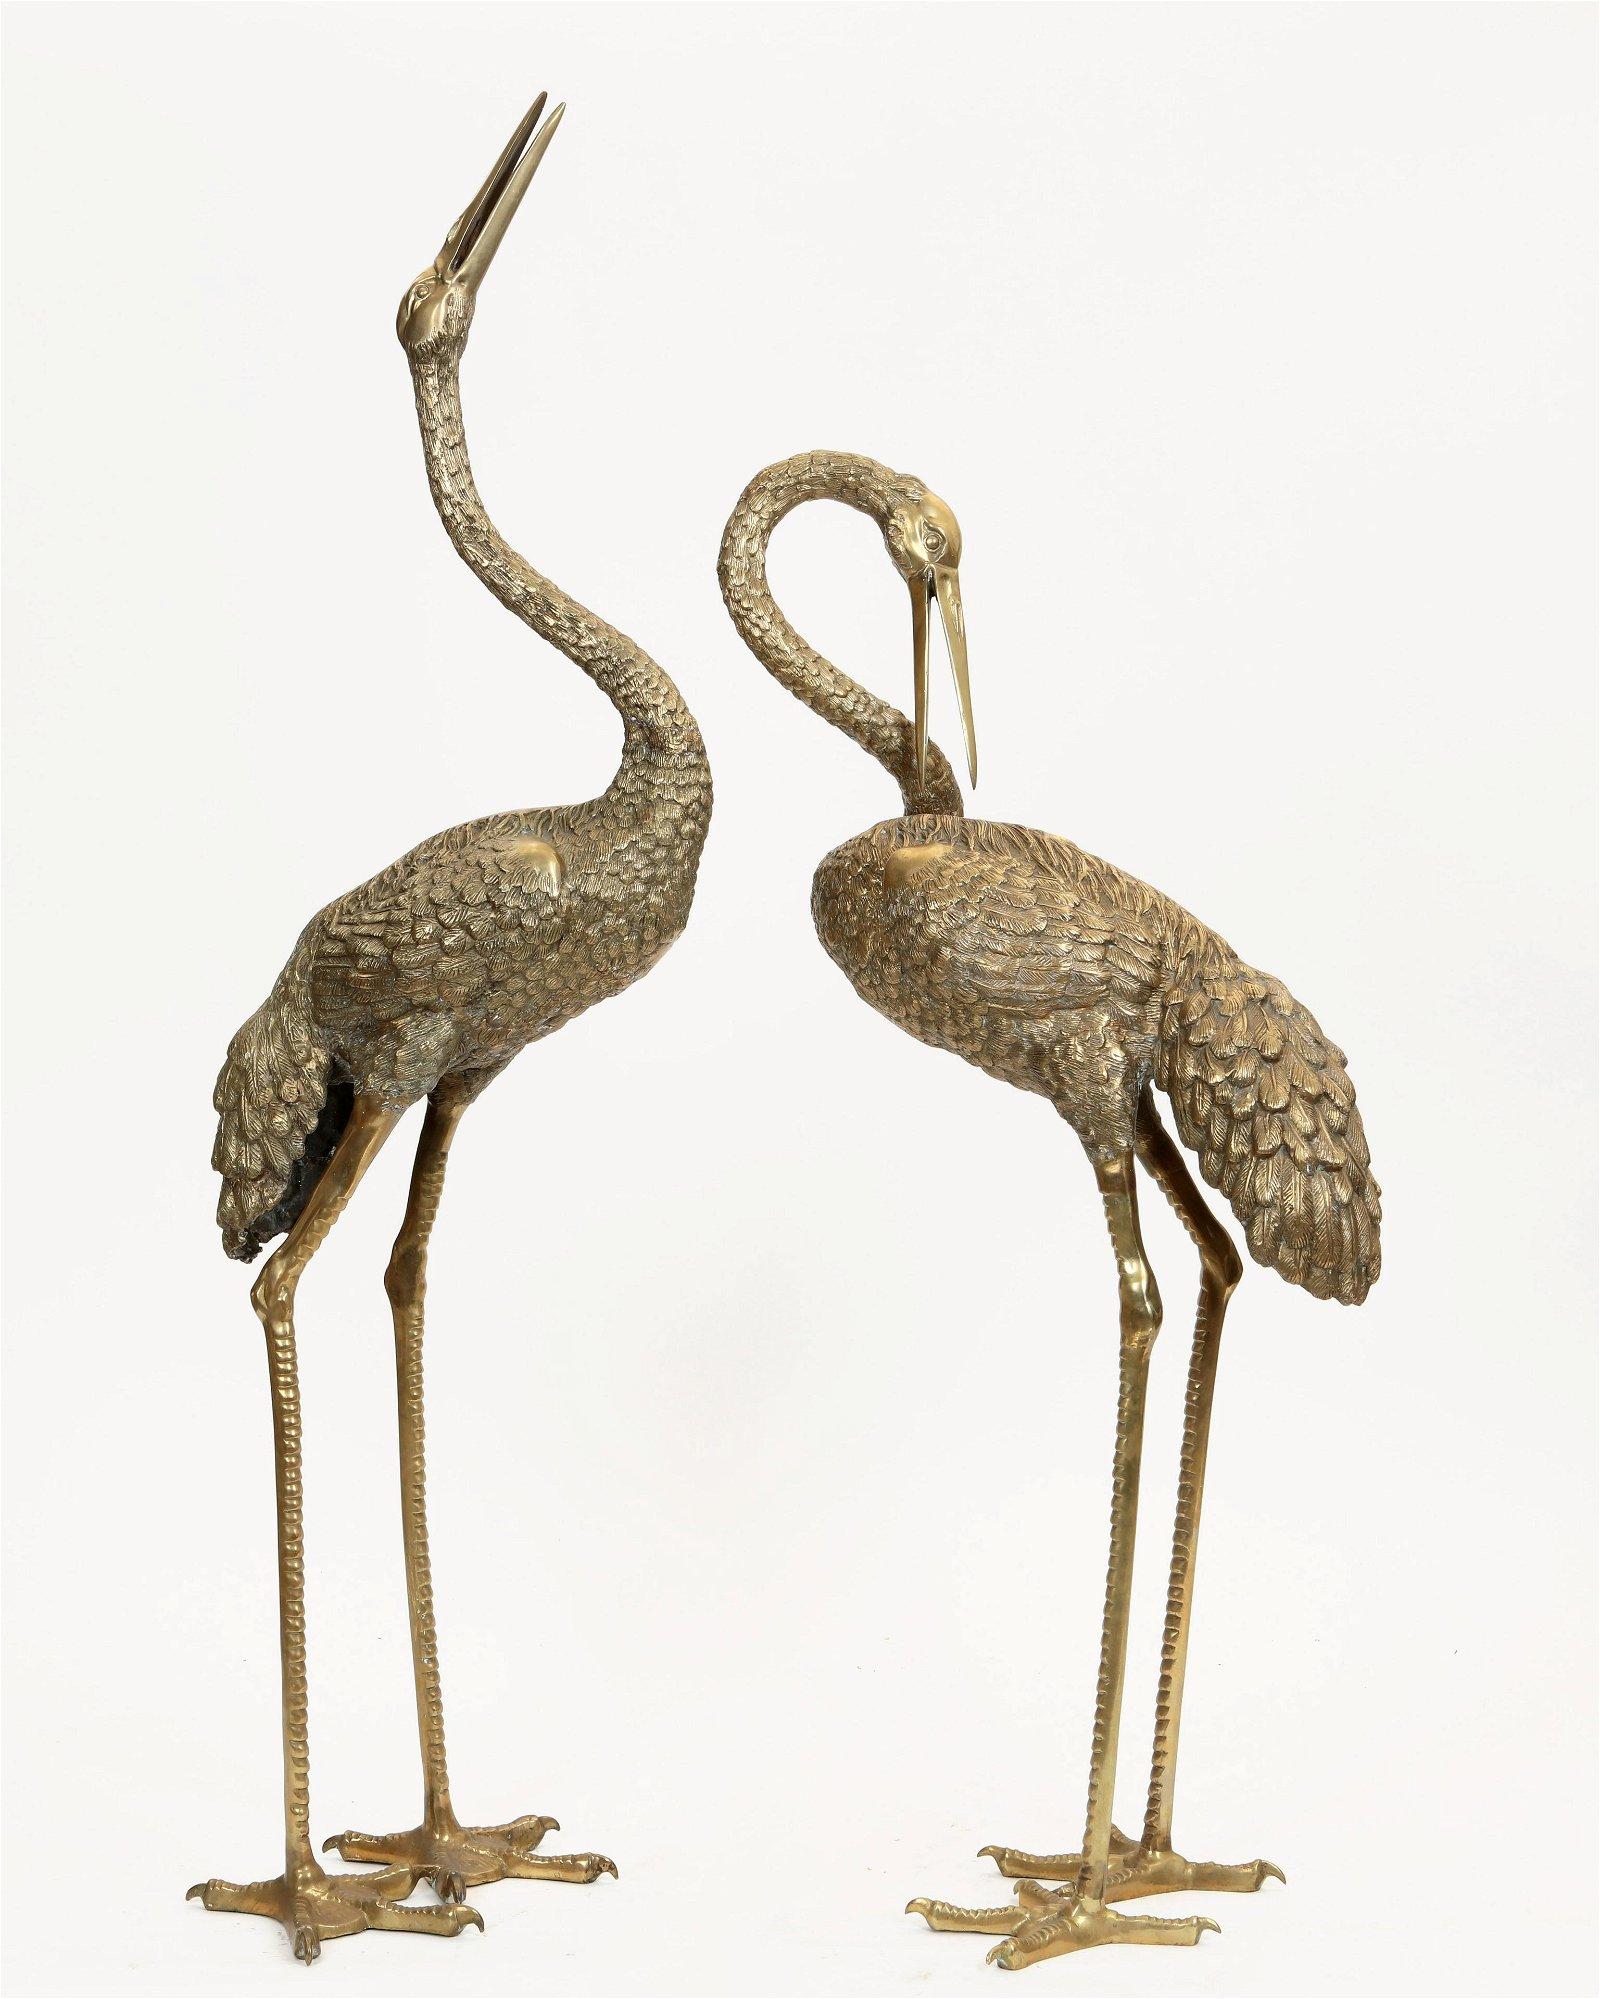 Pair of life size Asian bronze figures of cranes